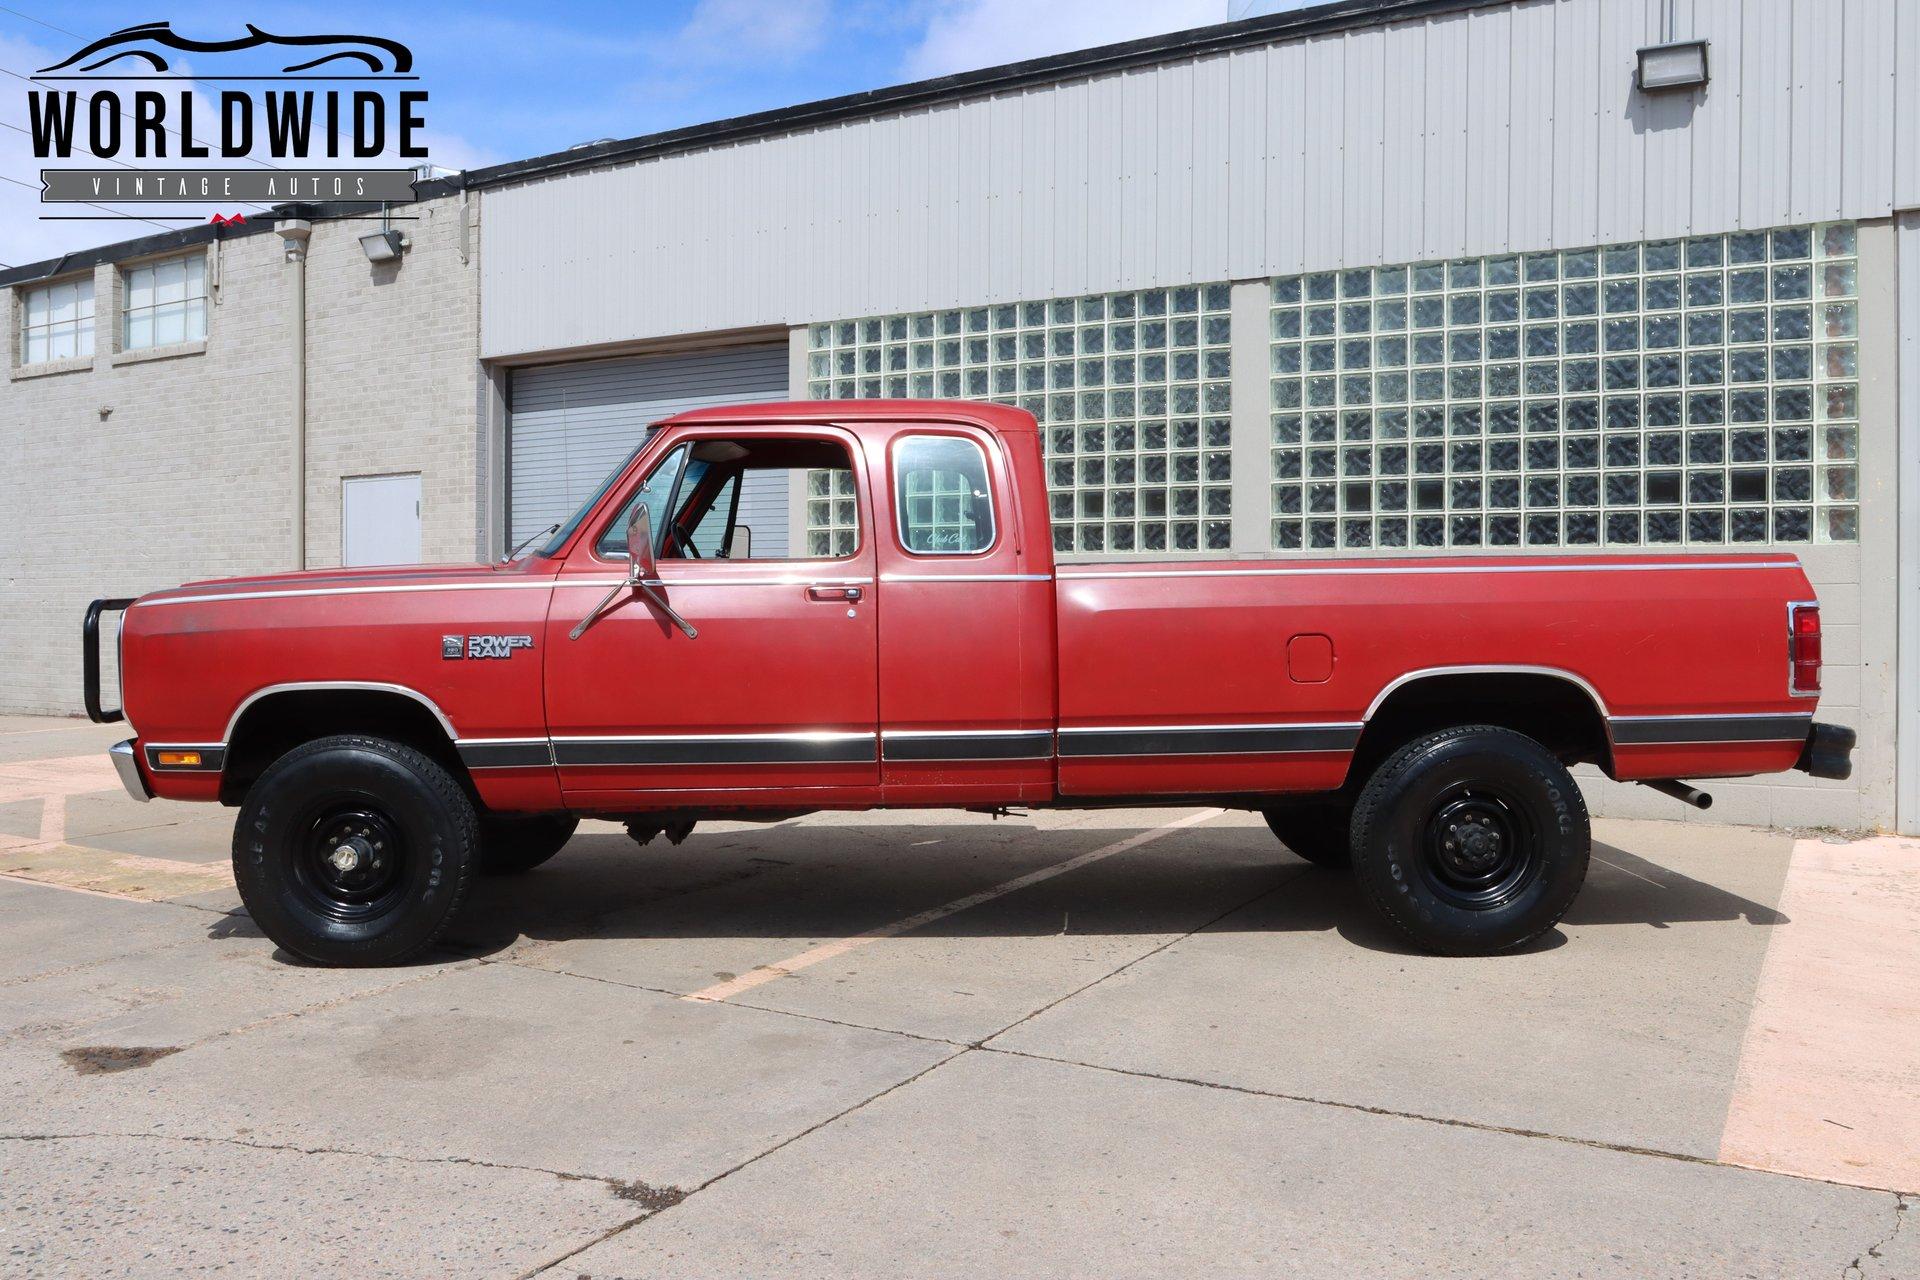 1982 Dodge Power Ram W-series